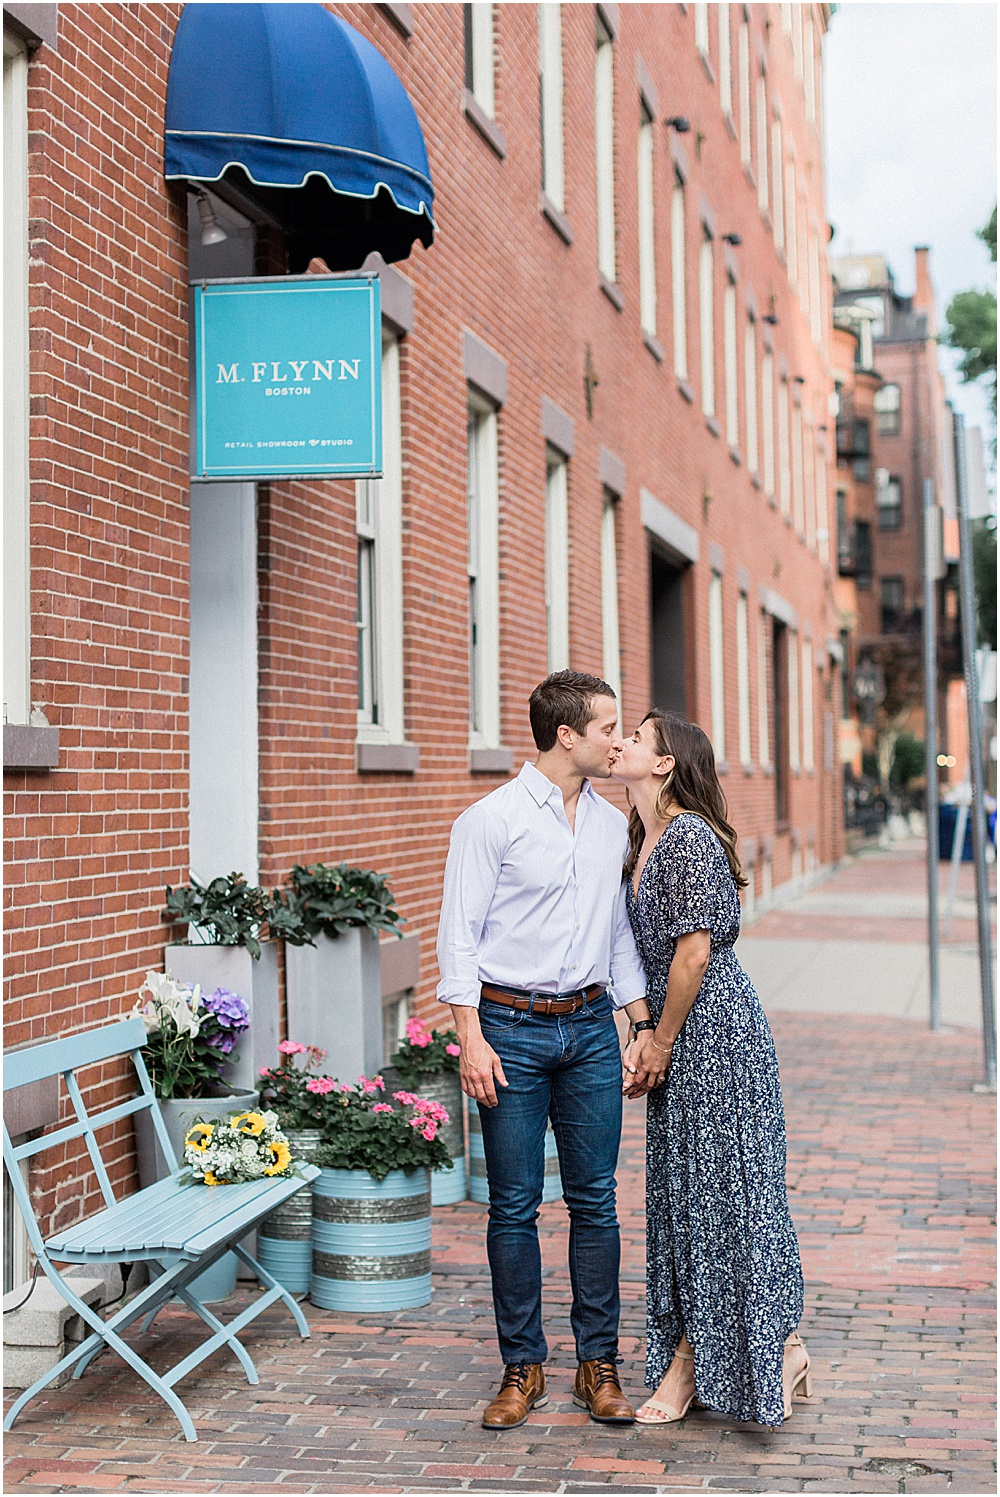 south_end_m_flynn_showroom_ring_oval_engagement_session_massachusetts_boston_wedding_photographer_meredith_jane_photography_photo_0475.jpg